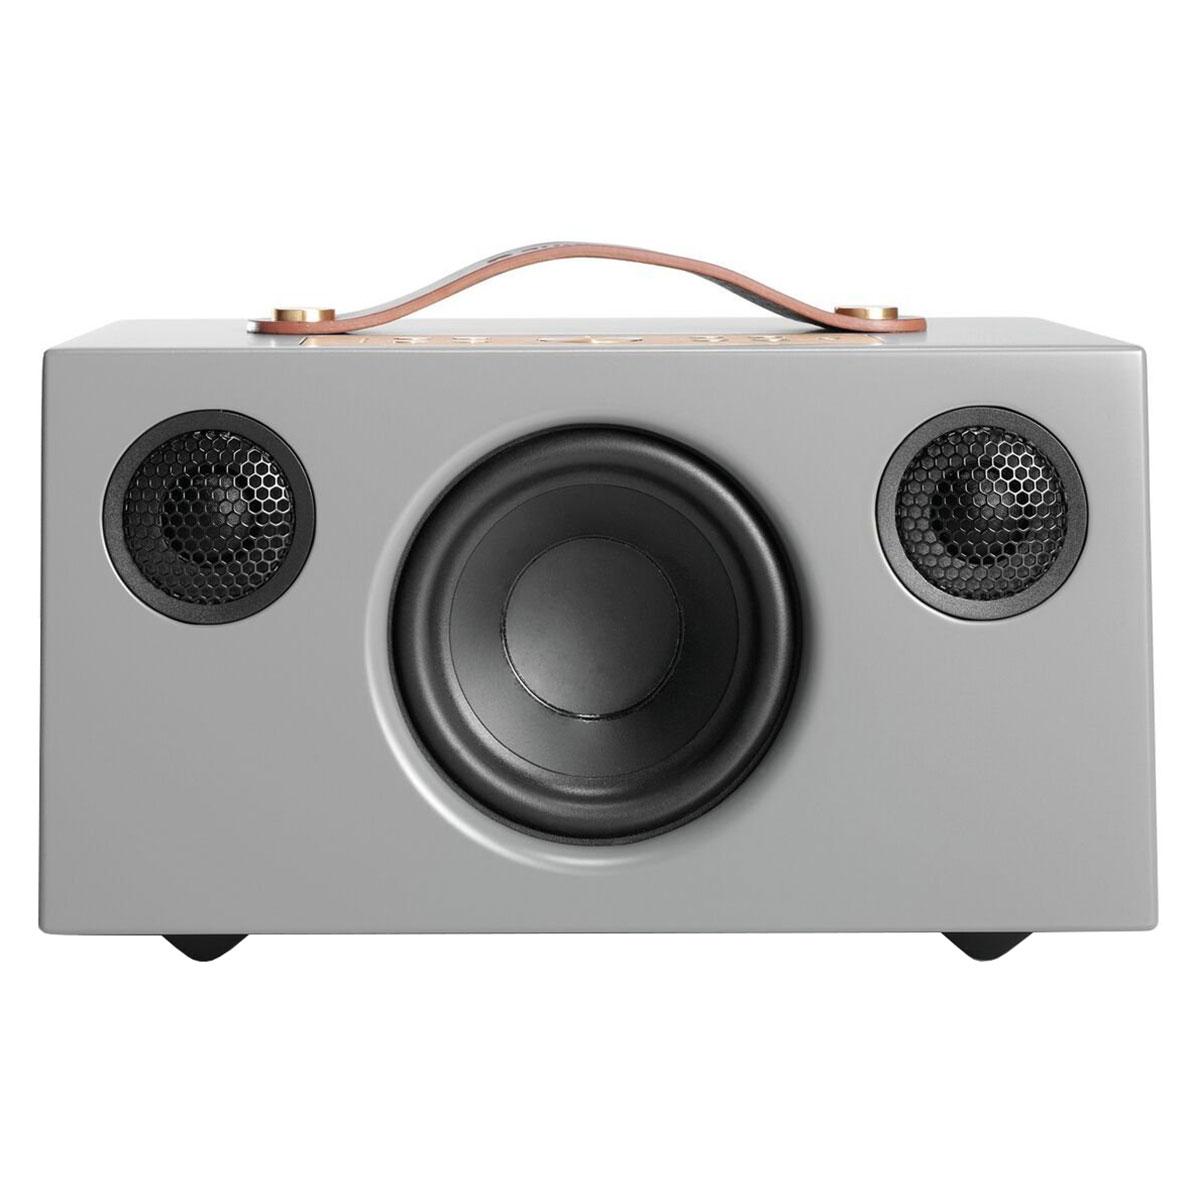 Dock & Enceinte Bluetooth Audio Pro Addon C5 Gris Enceinte sans fil multiroom avec Wi-Fi, Bluetooth, AirPlay, Spotify Connect et USB